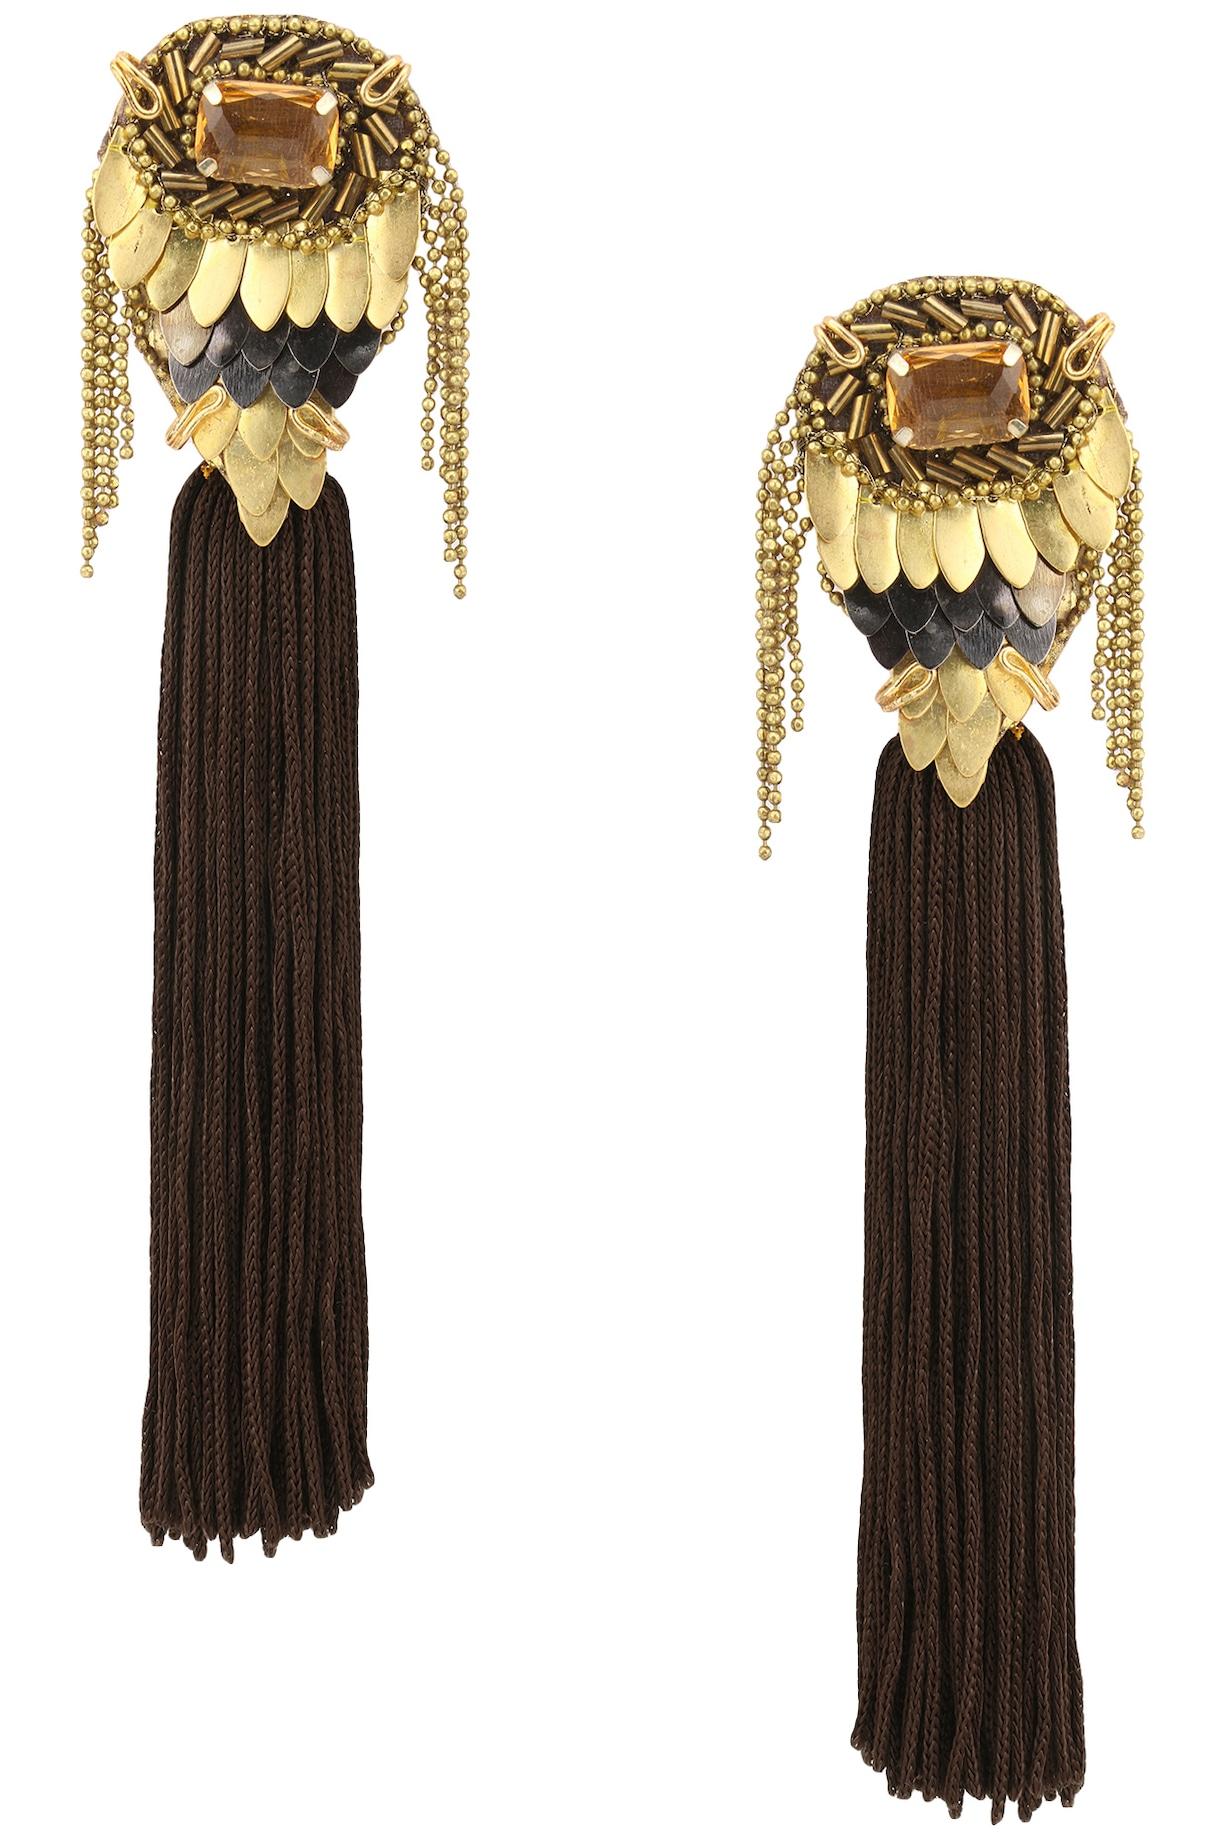 TI Couture By Tania M Kathuria Earrings